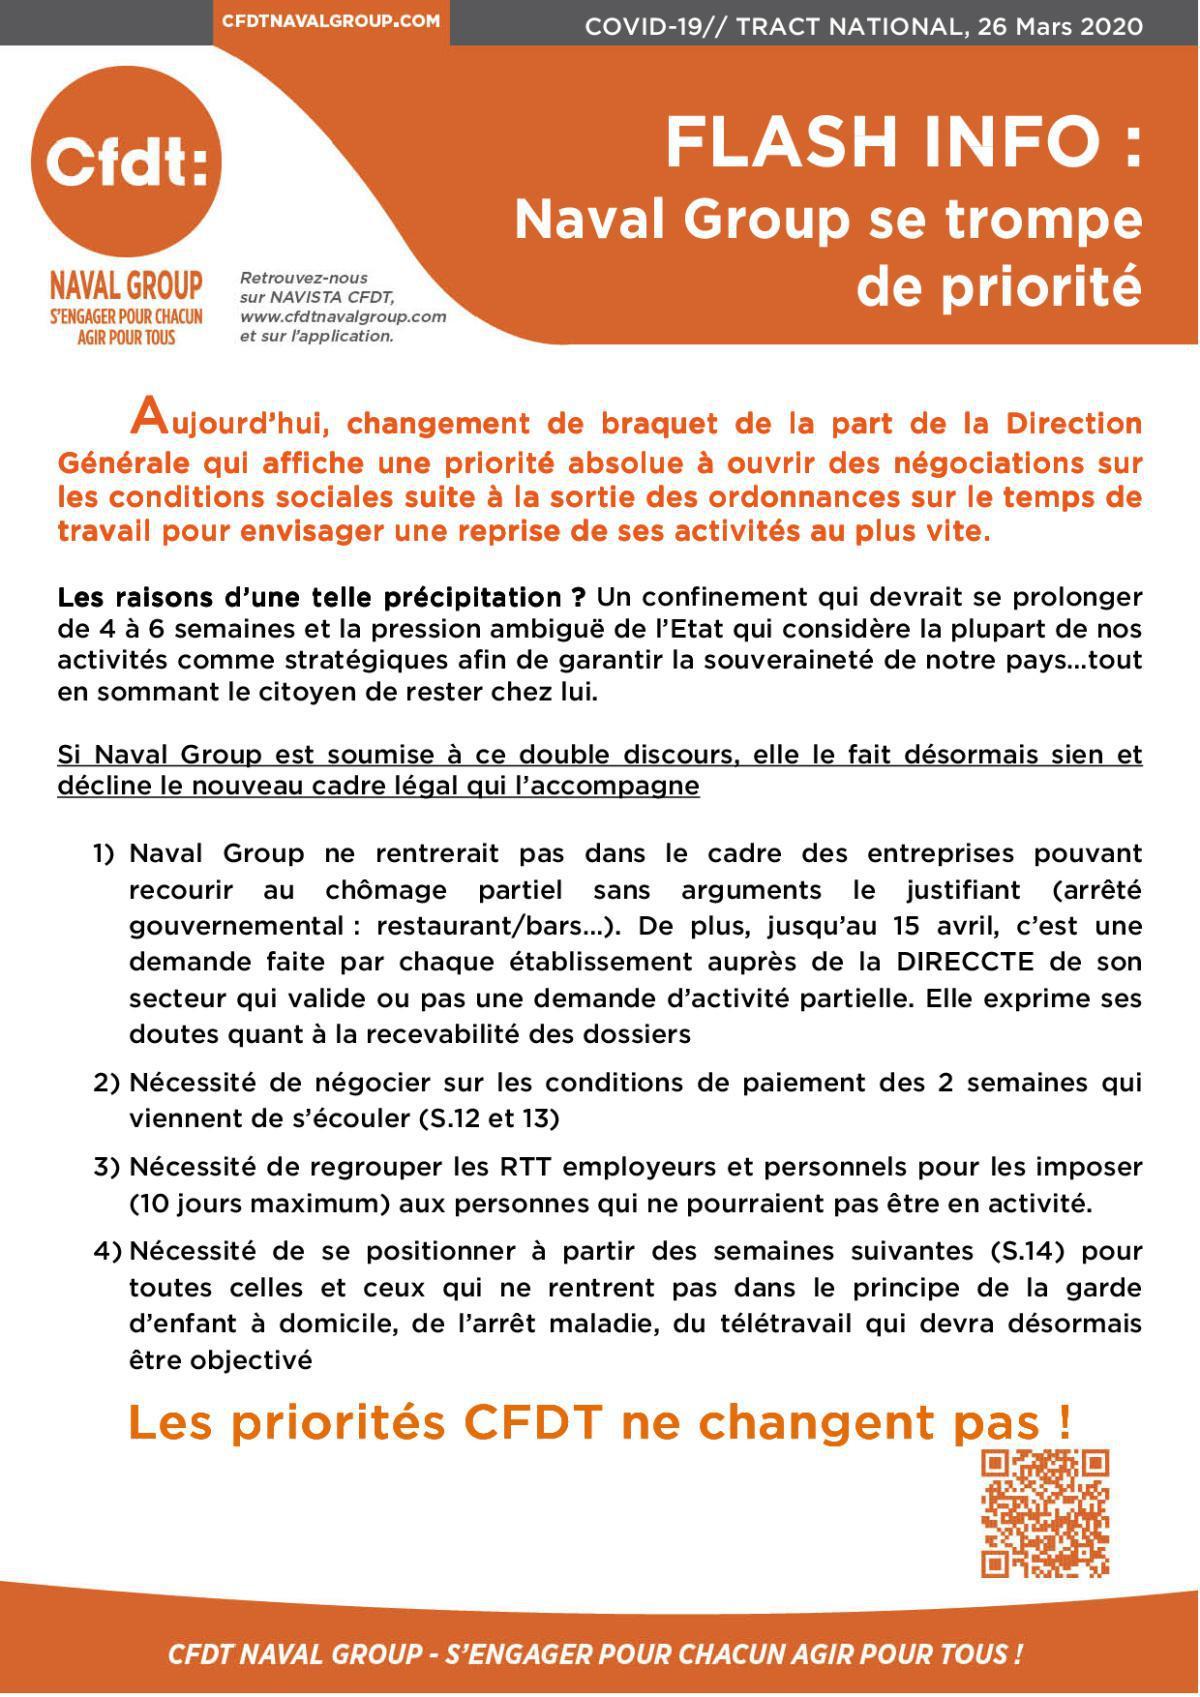 COVID 19 TRACT NATIONAL du 26 mars 2020